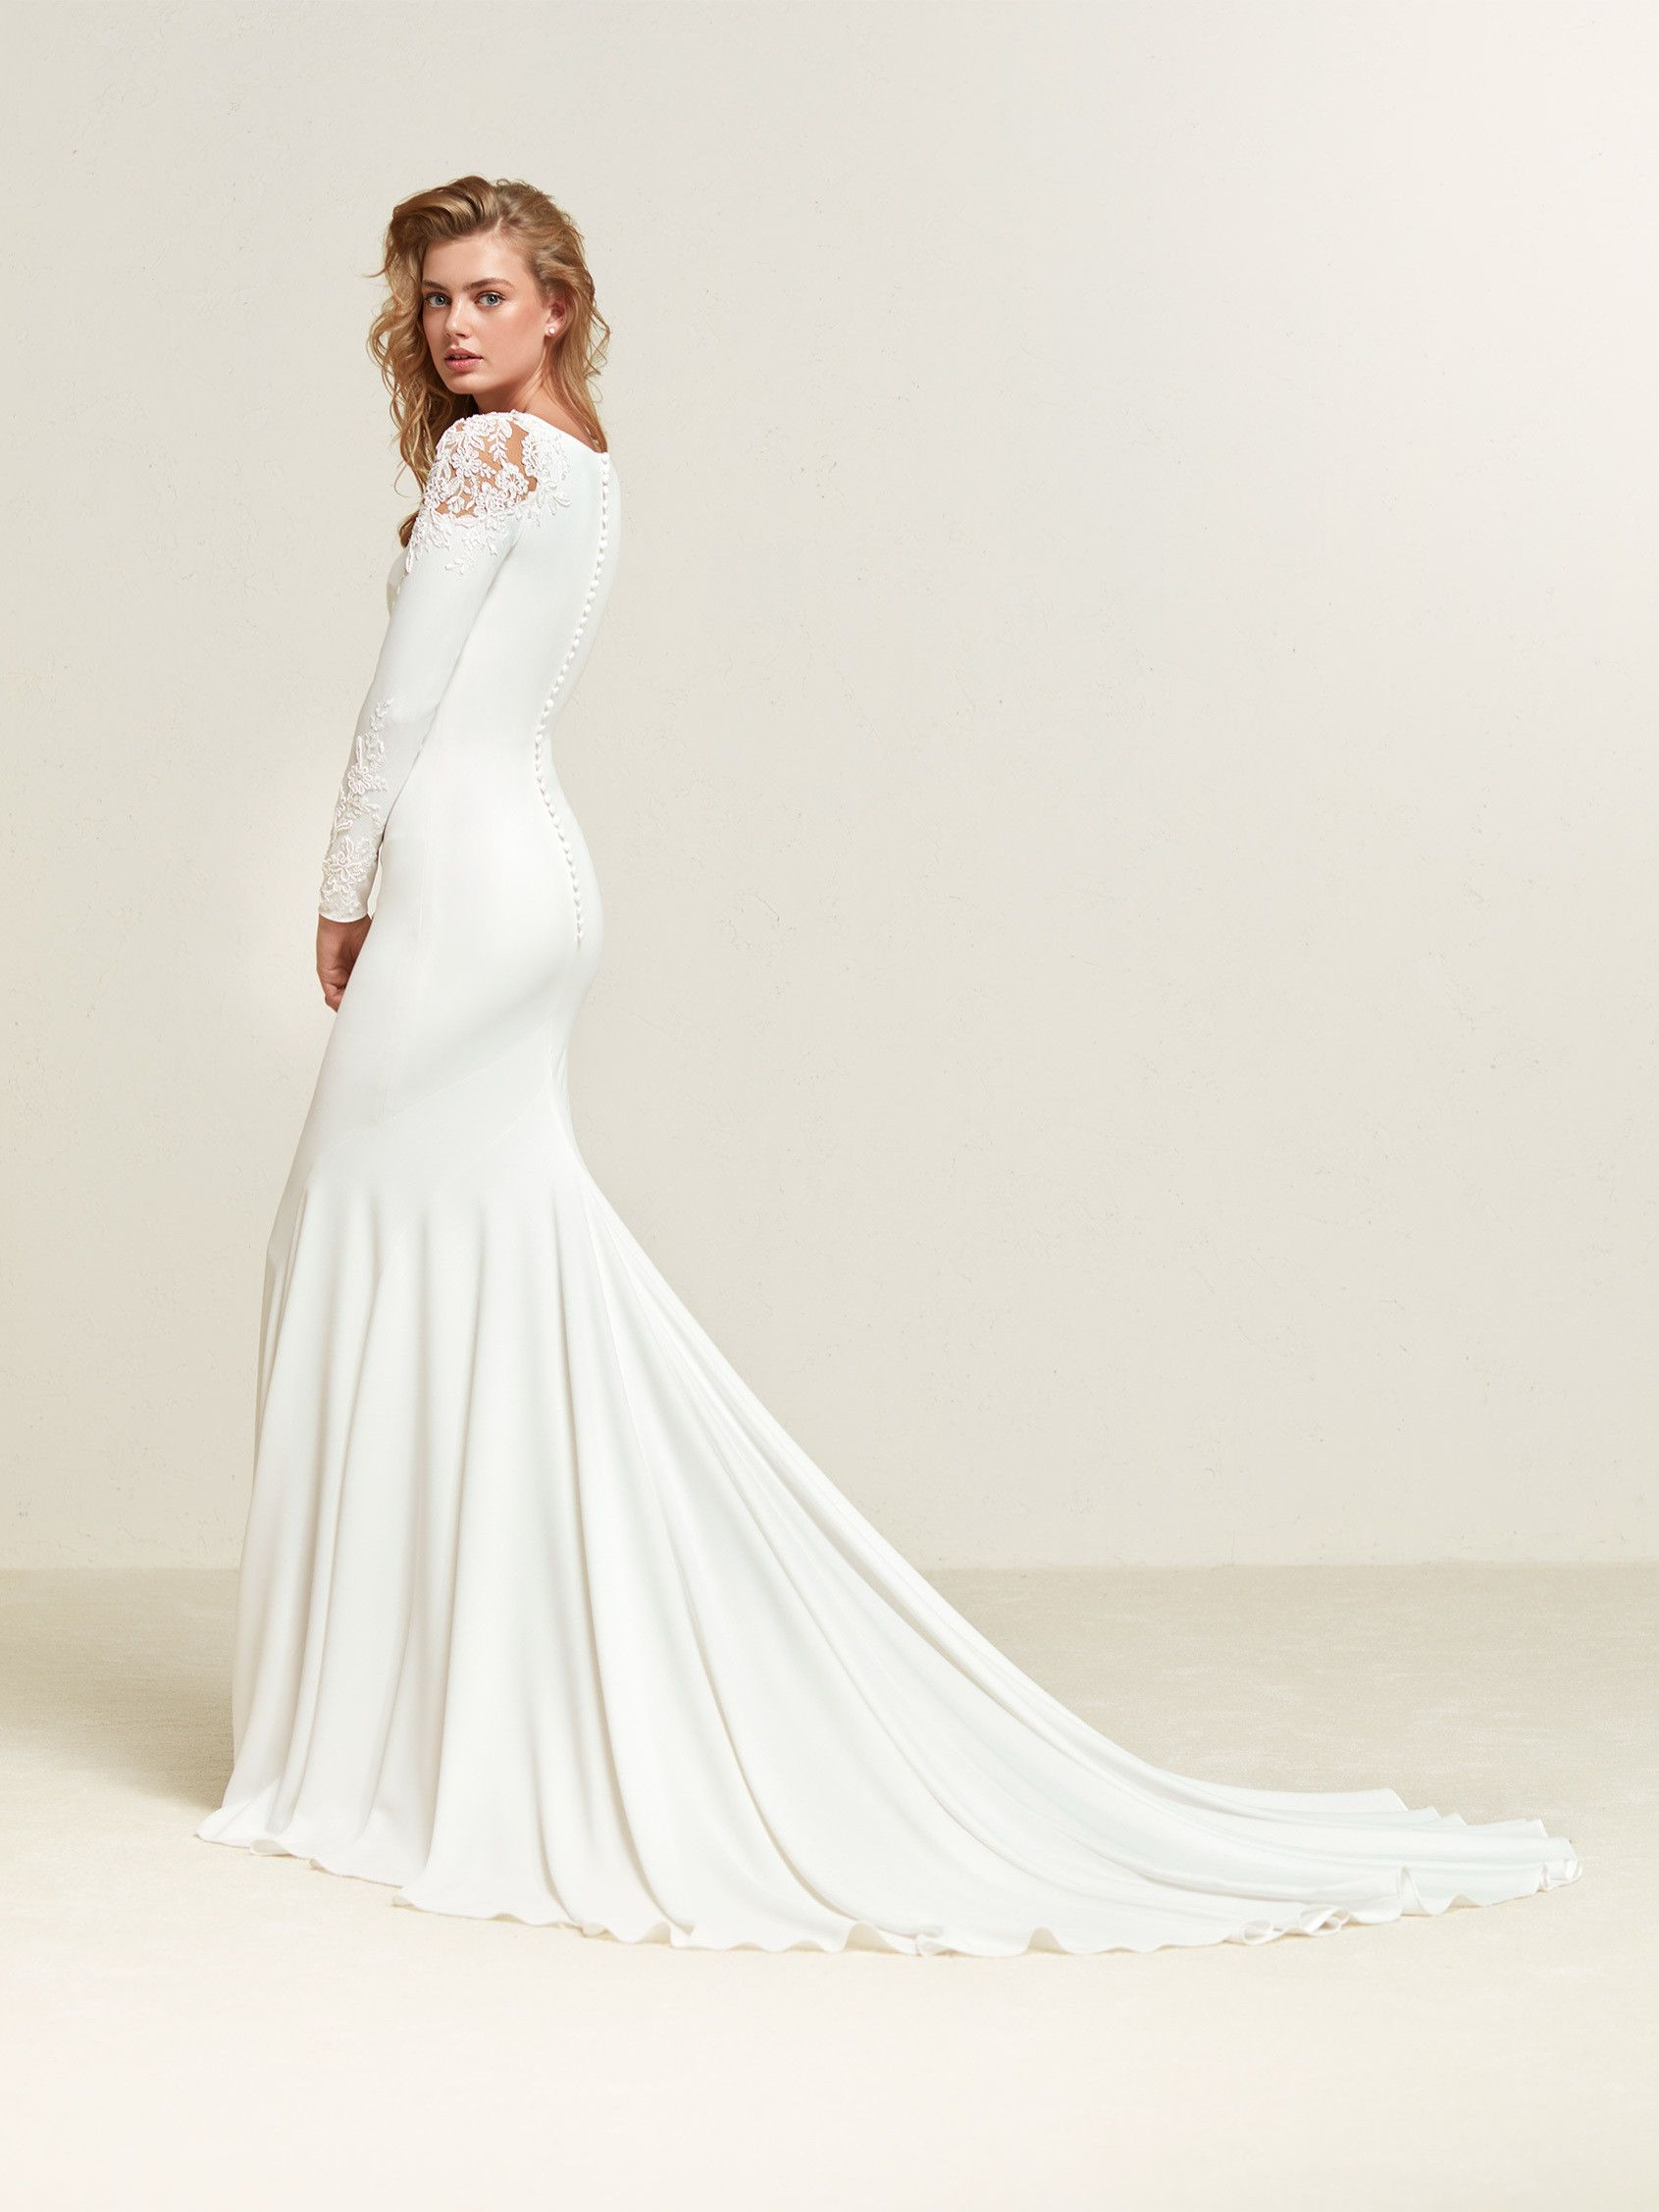 Vestido para novias con clase - Dreide - Pronovias | Novias | Pinterest